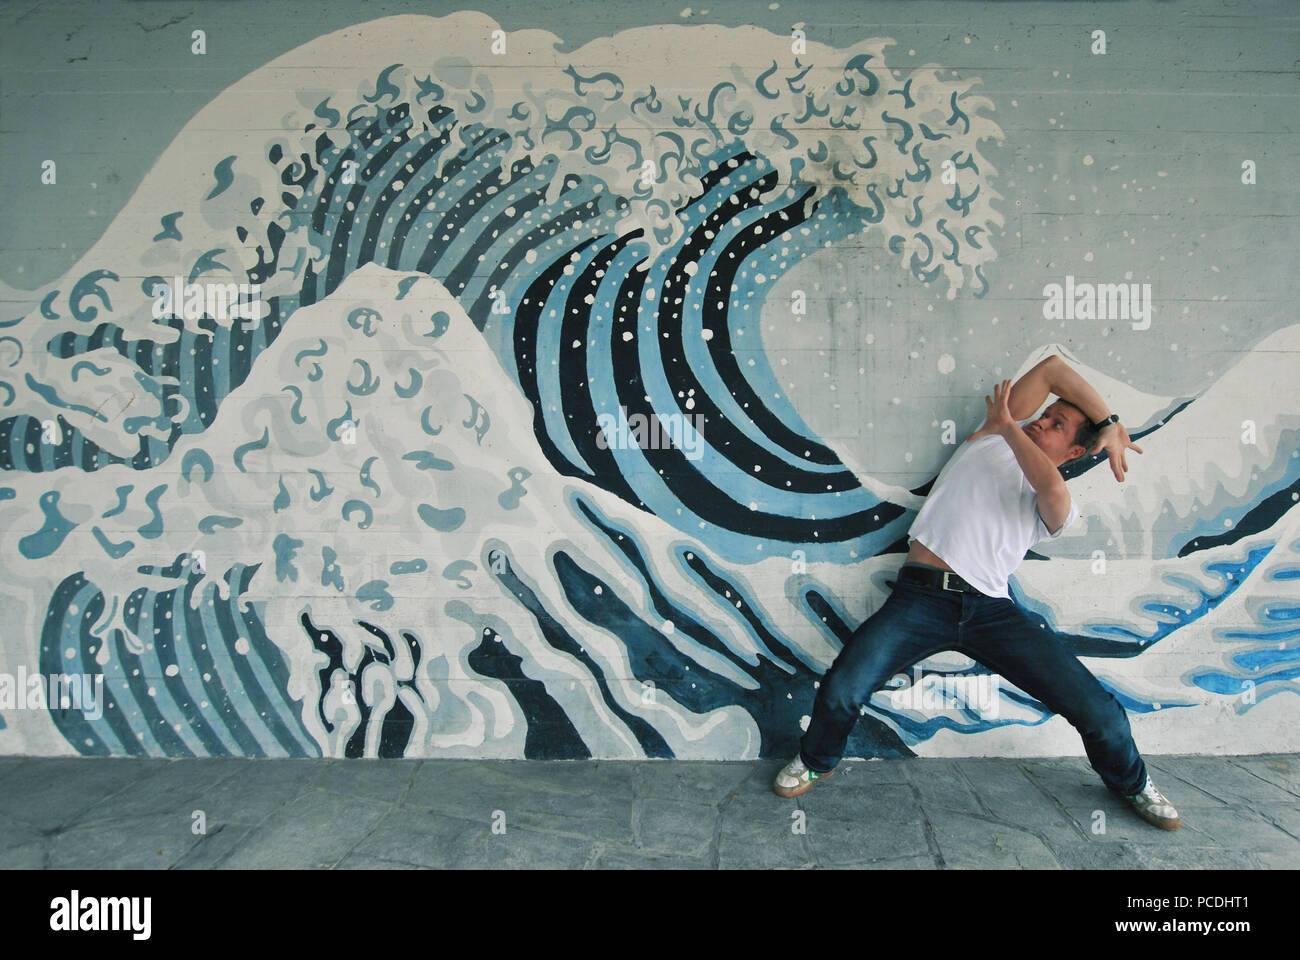 Flut, Wave, Schützen, Tsunami Stockbild